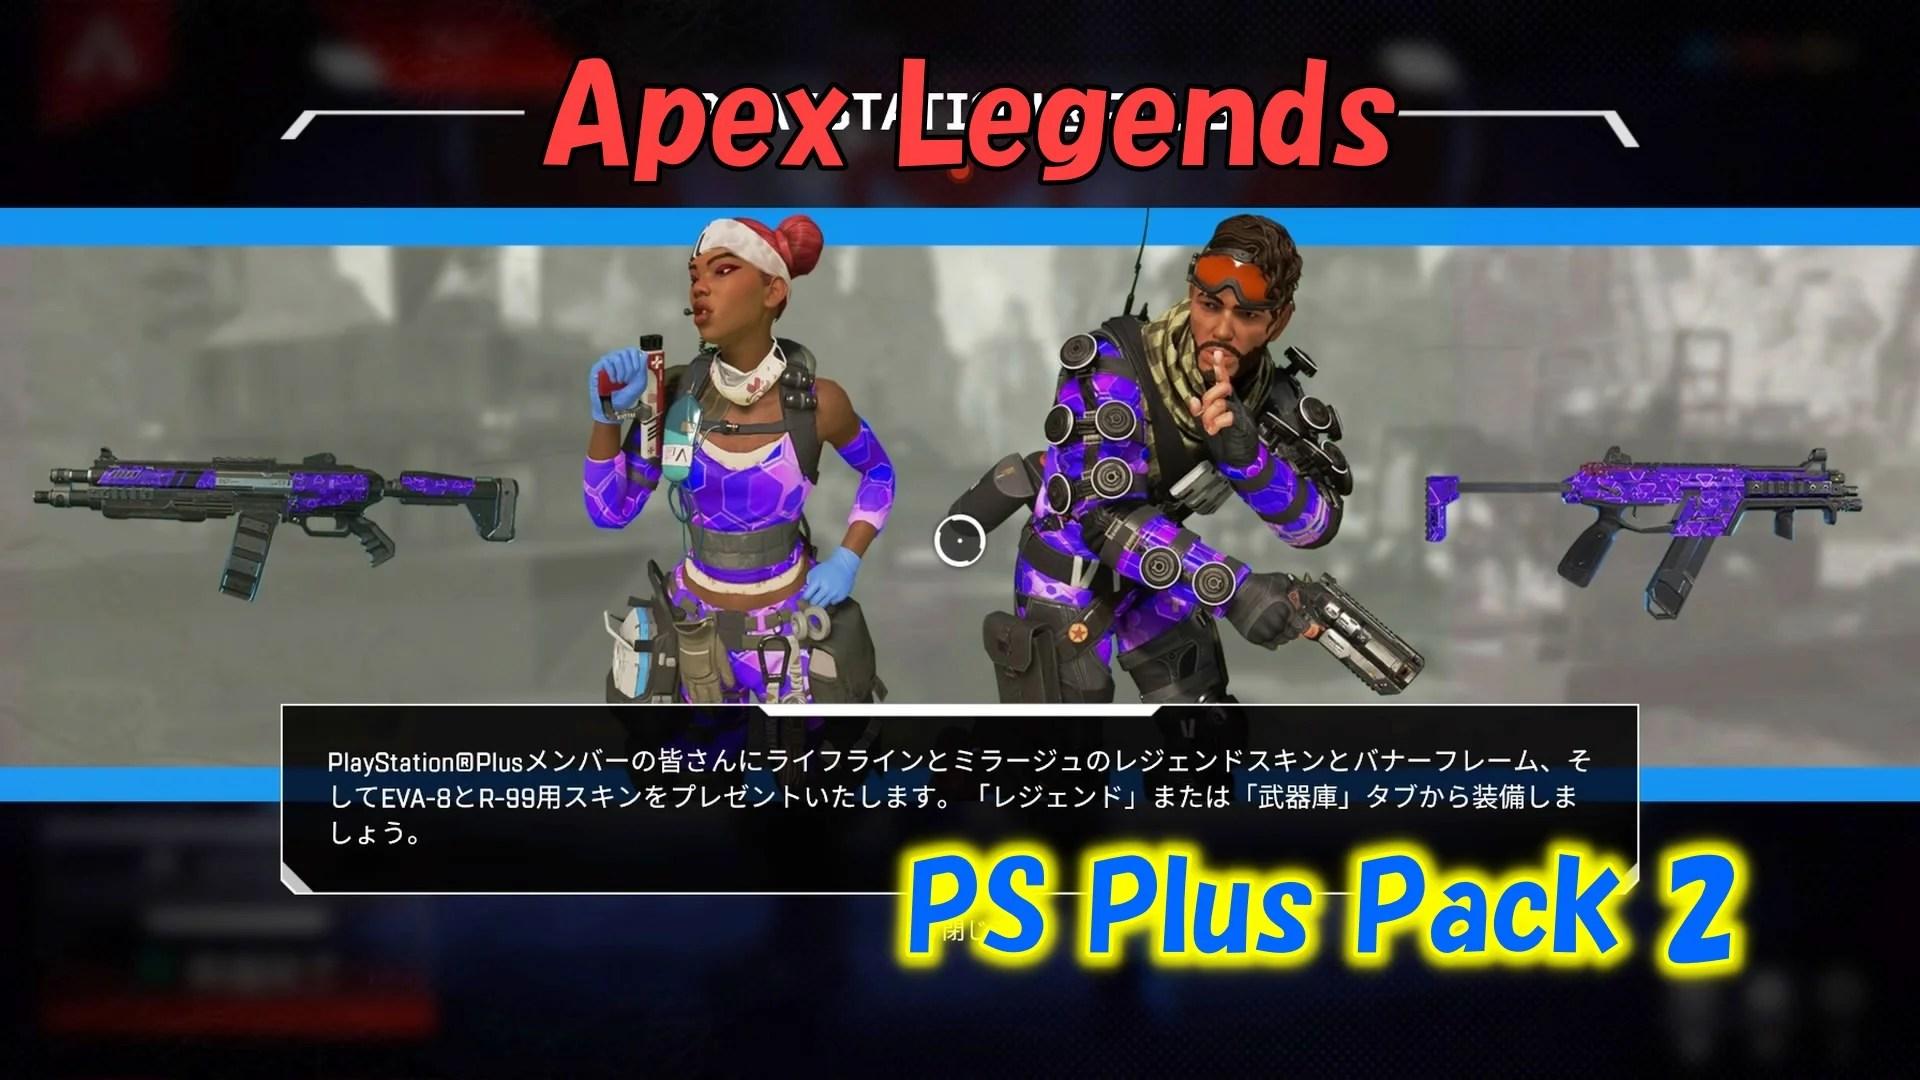 【Apex legends】無料スキンPS Plus加入者特典プレイパック2を配布中